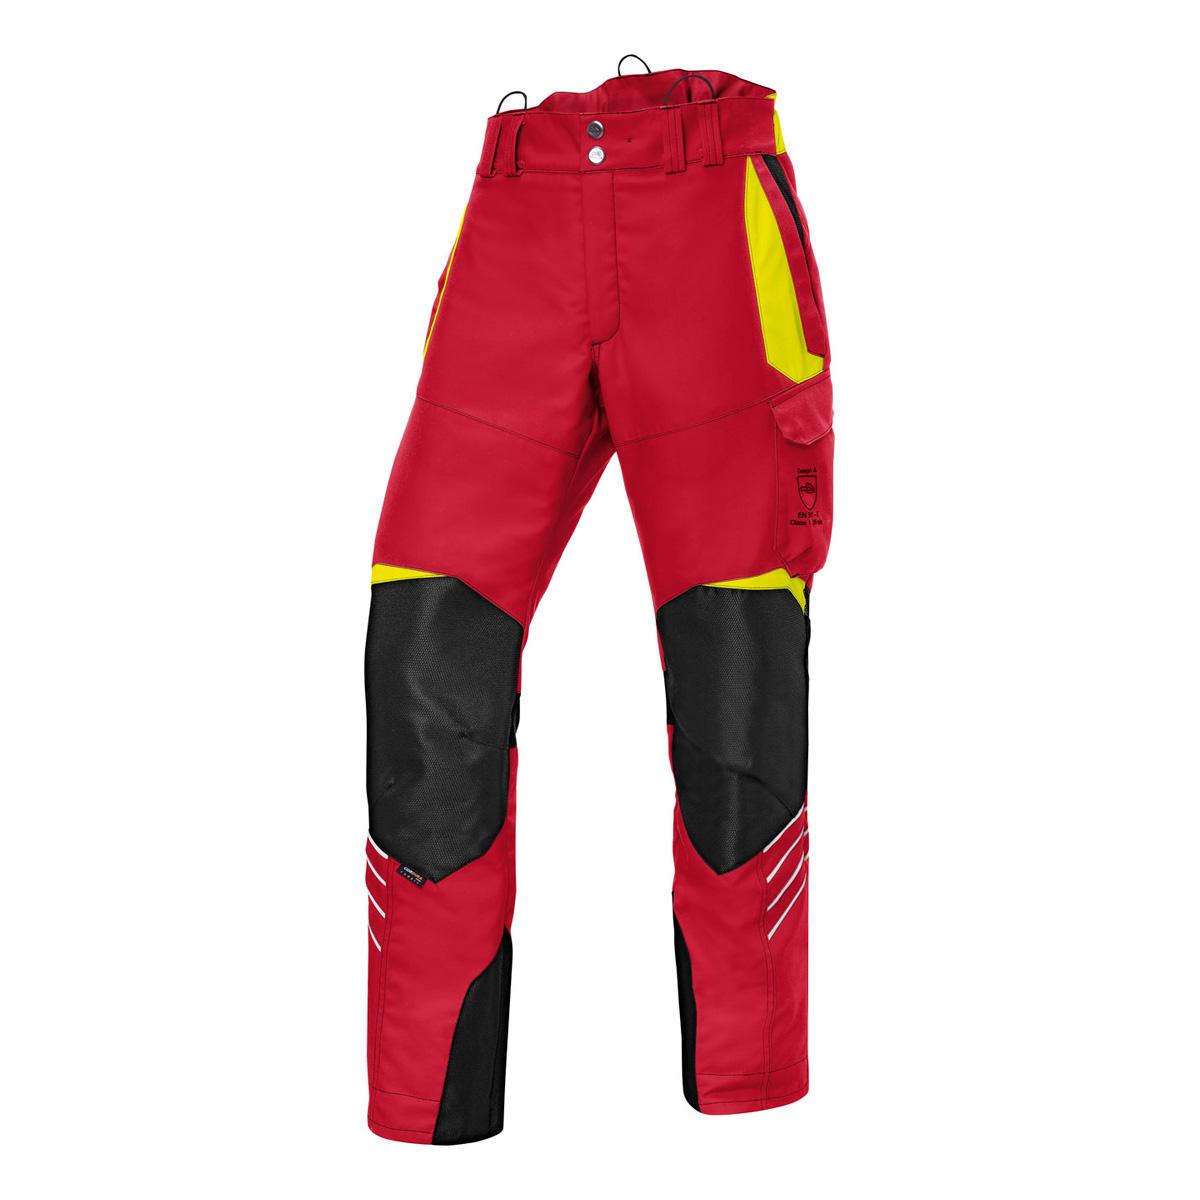 Kubler pantalon anticoupure